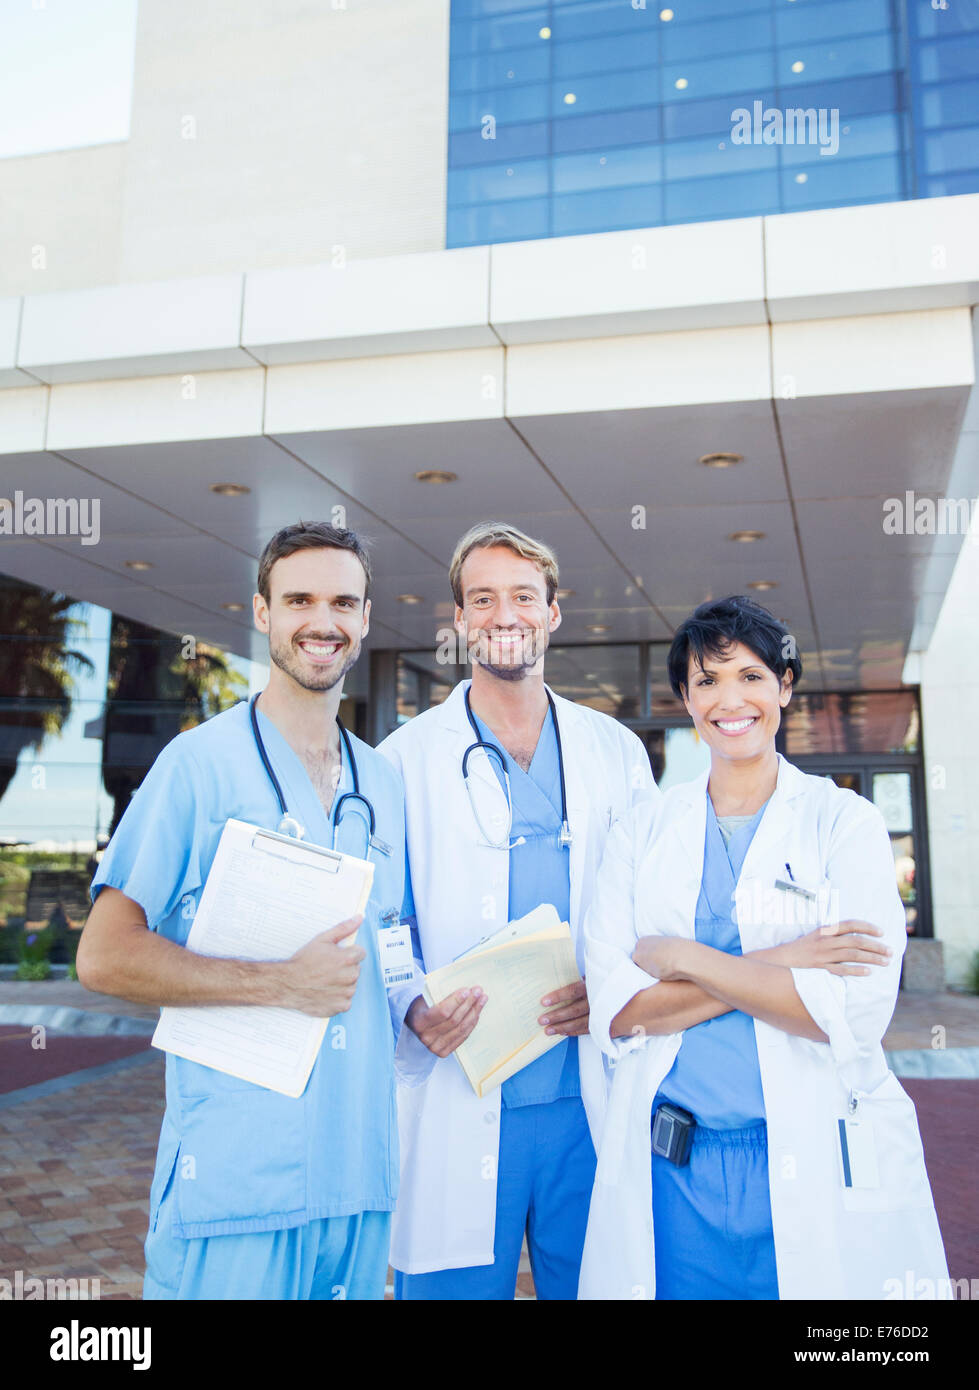 Doctors and nurse smiling outside hospital - Stock Image